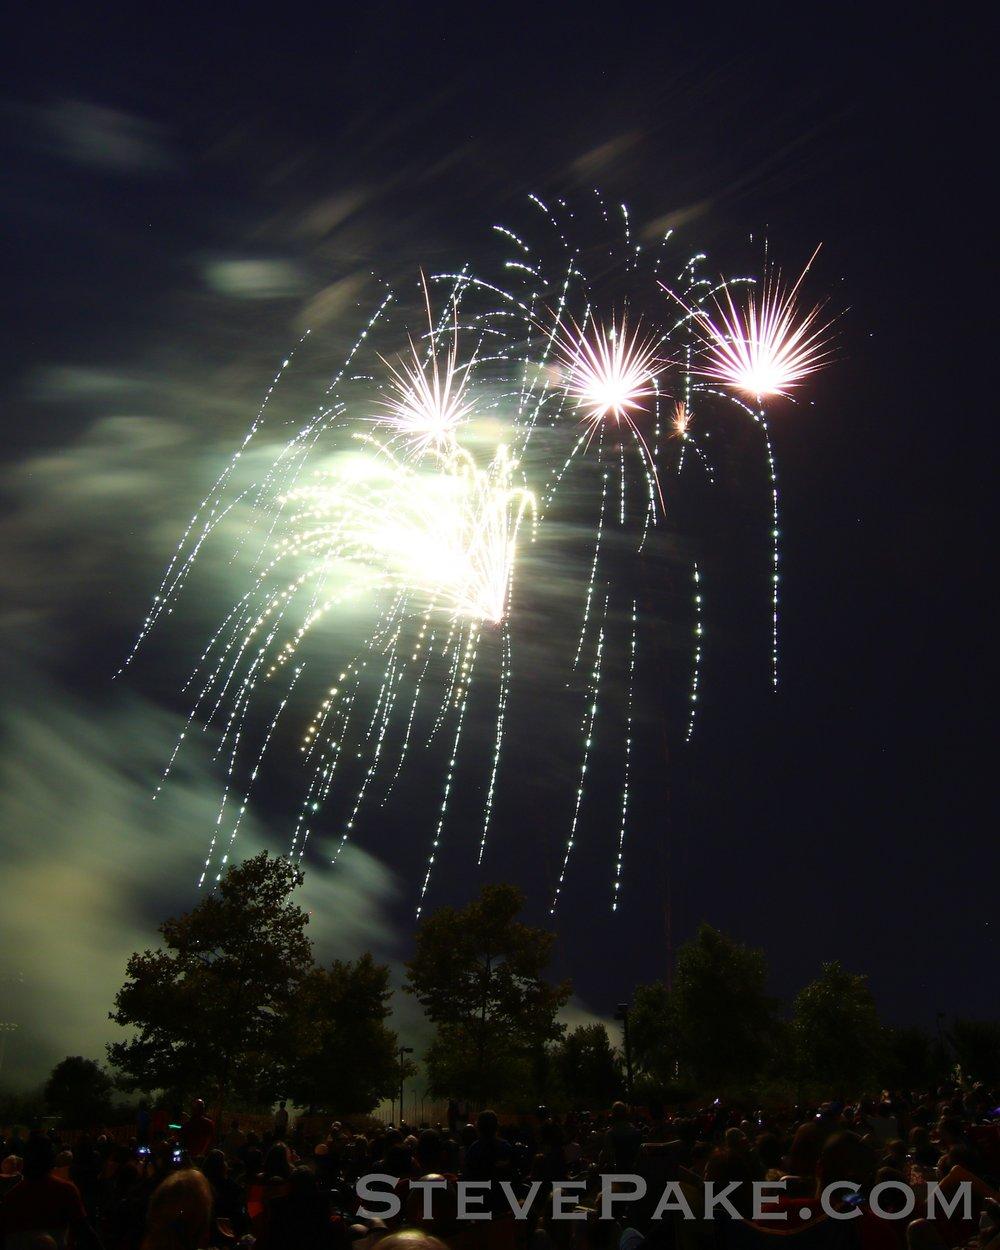 Fireworks2018_42_GE3A8585vap-HD-WM.jpg